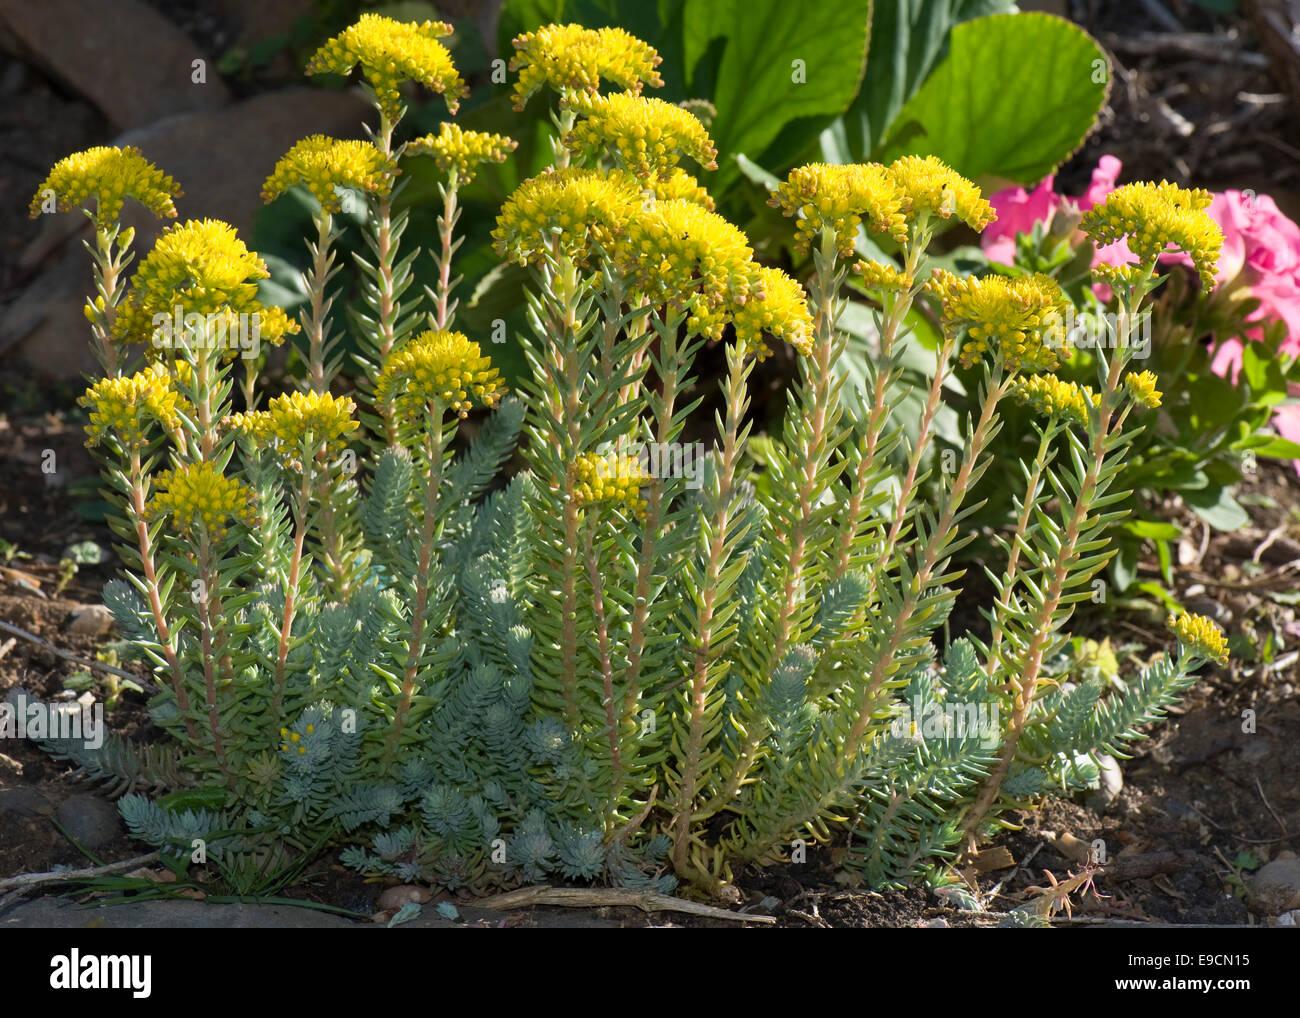 Sedum reflexum blue cushion a rockery plant with yellow flowers sedum reflexum blue cushion a rockery plant with yellow flowers june mightylinksfo